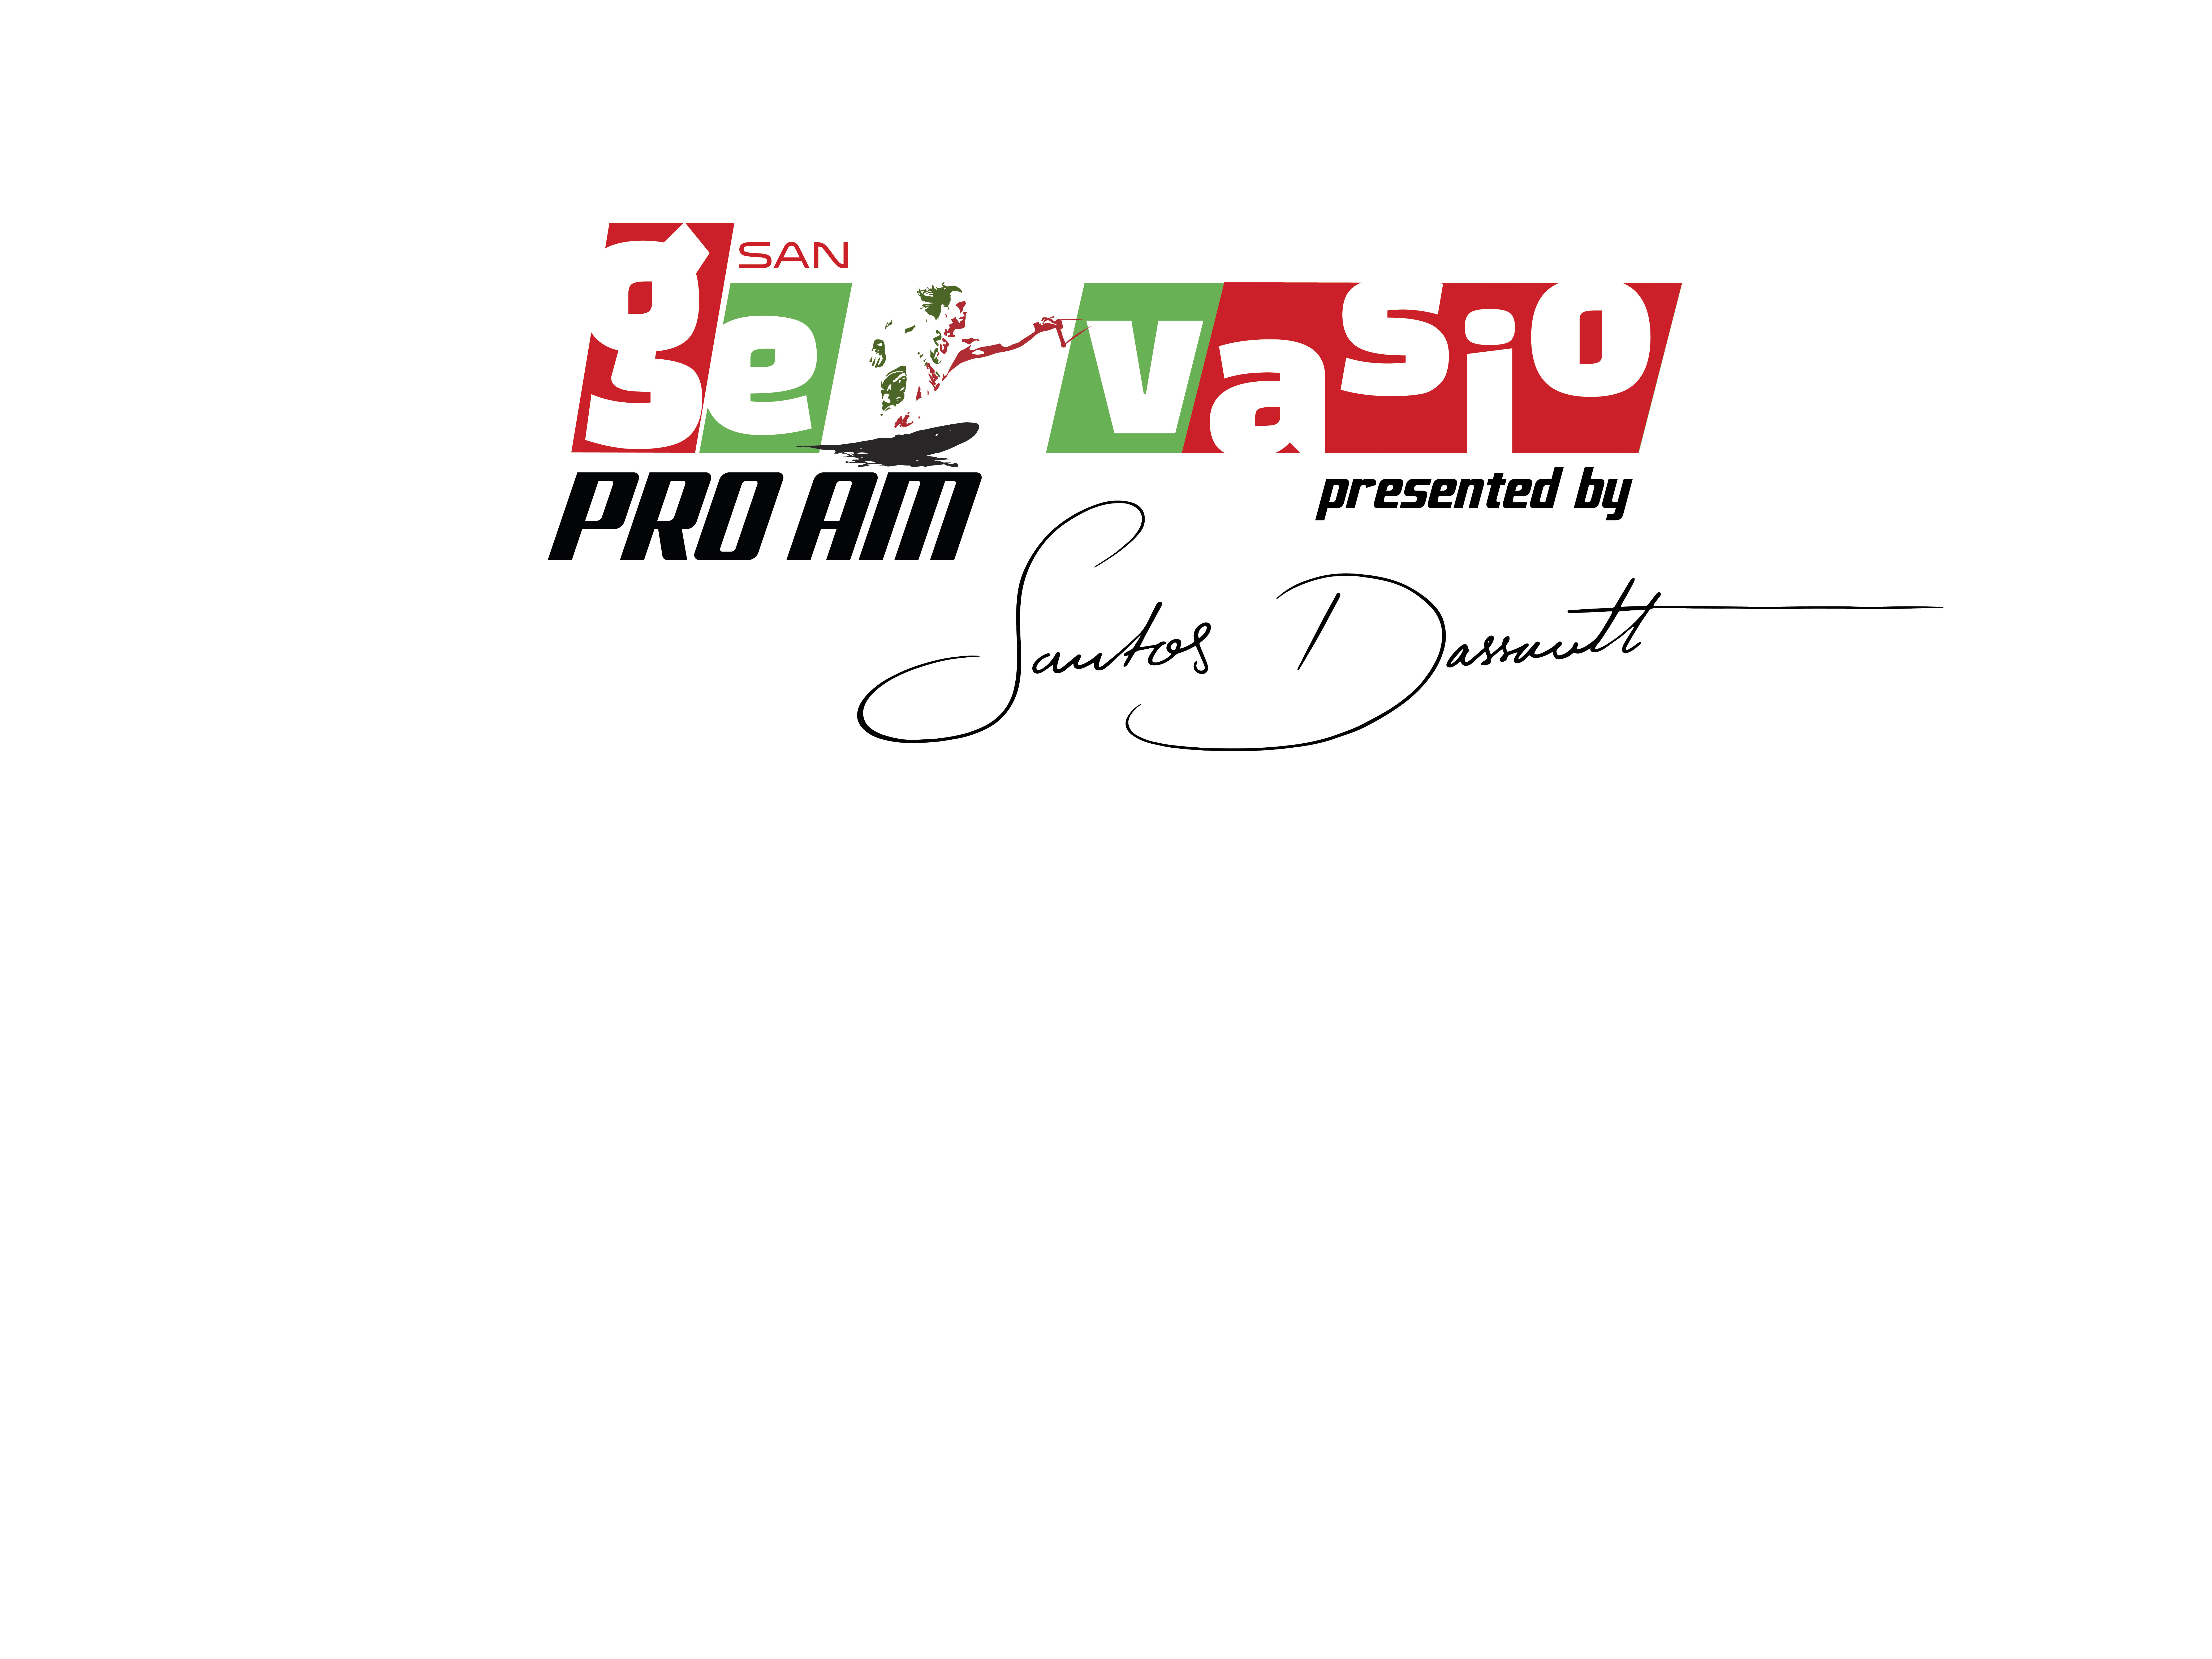 San Gervasio Pro AM live Webcast